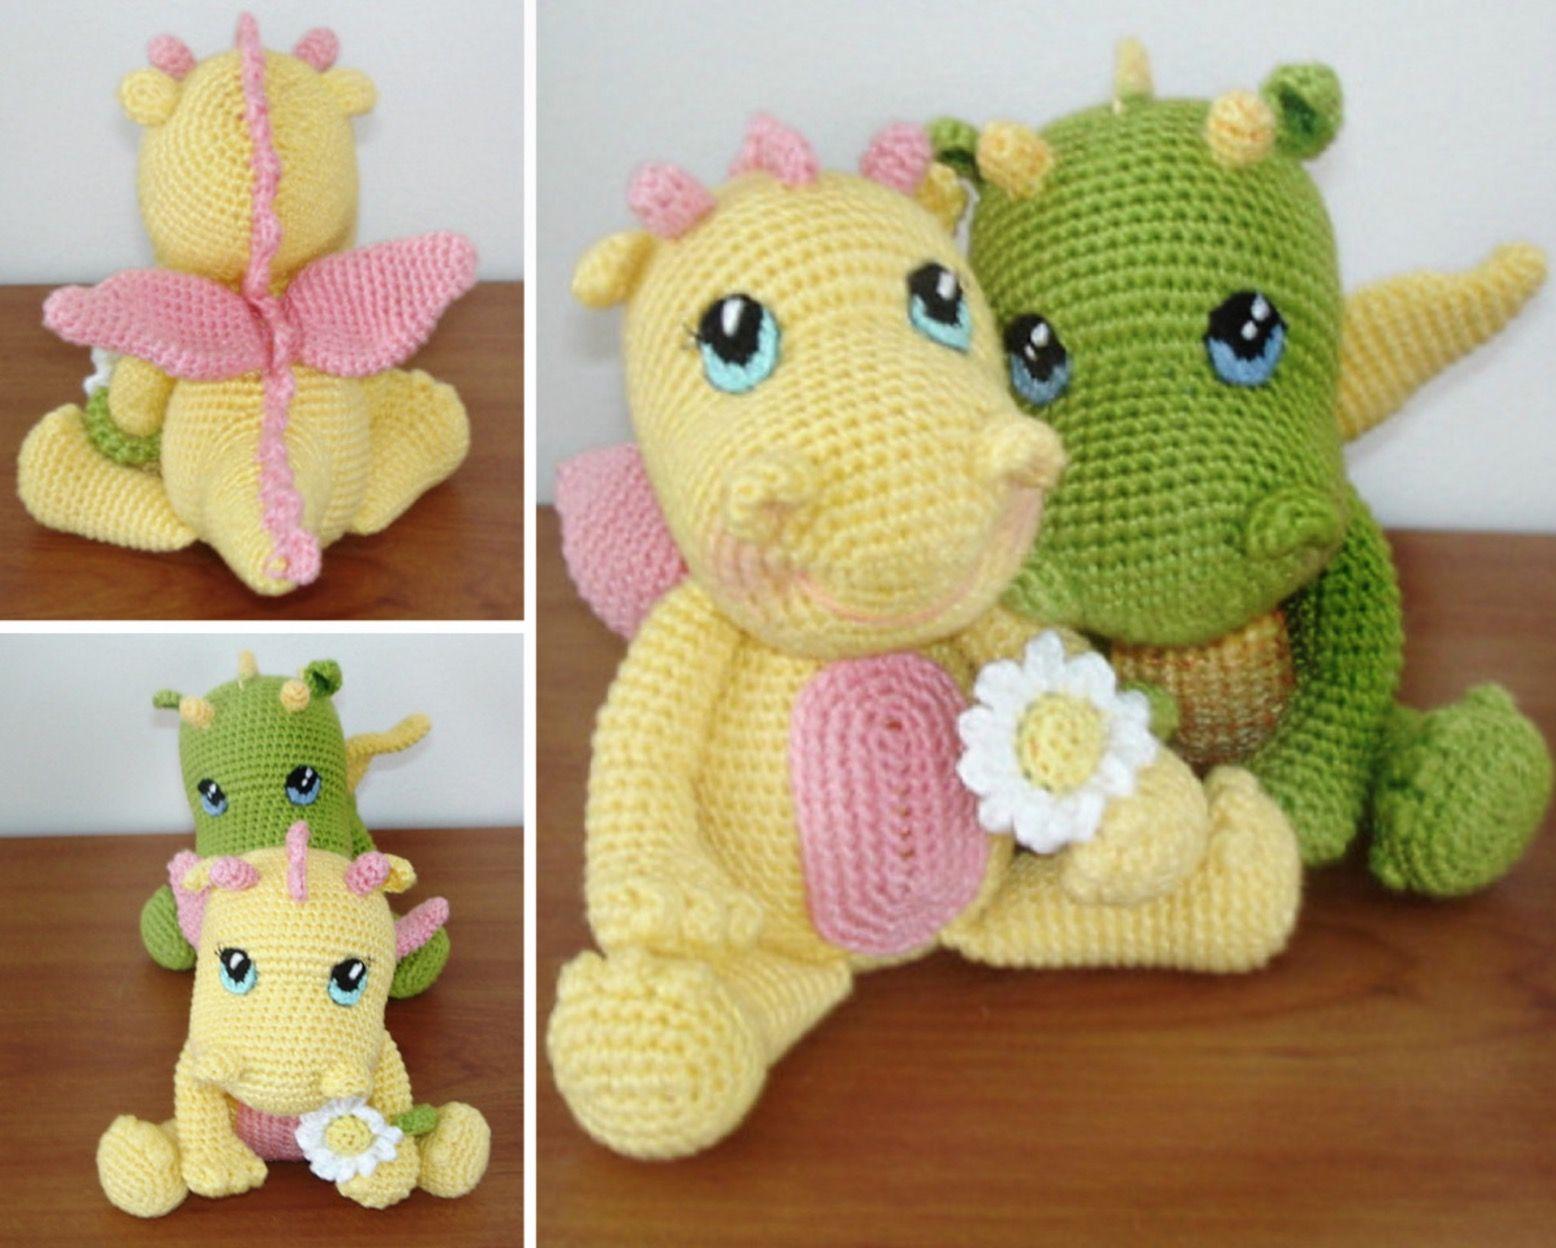 Amigurumi Baby Dragon Crochet Pattern | Pinterest